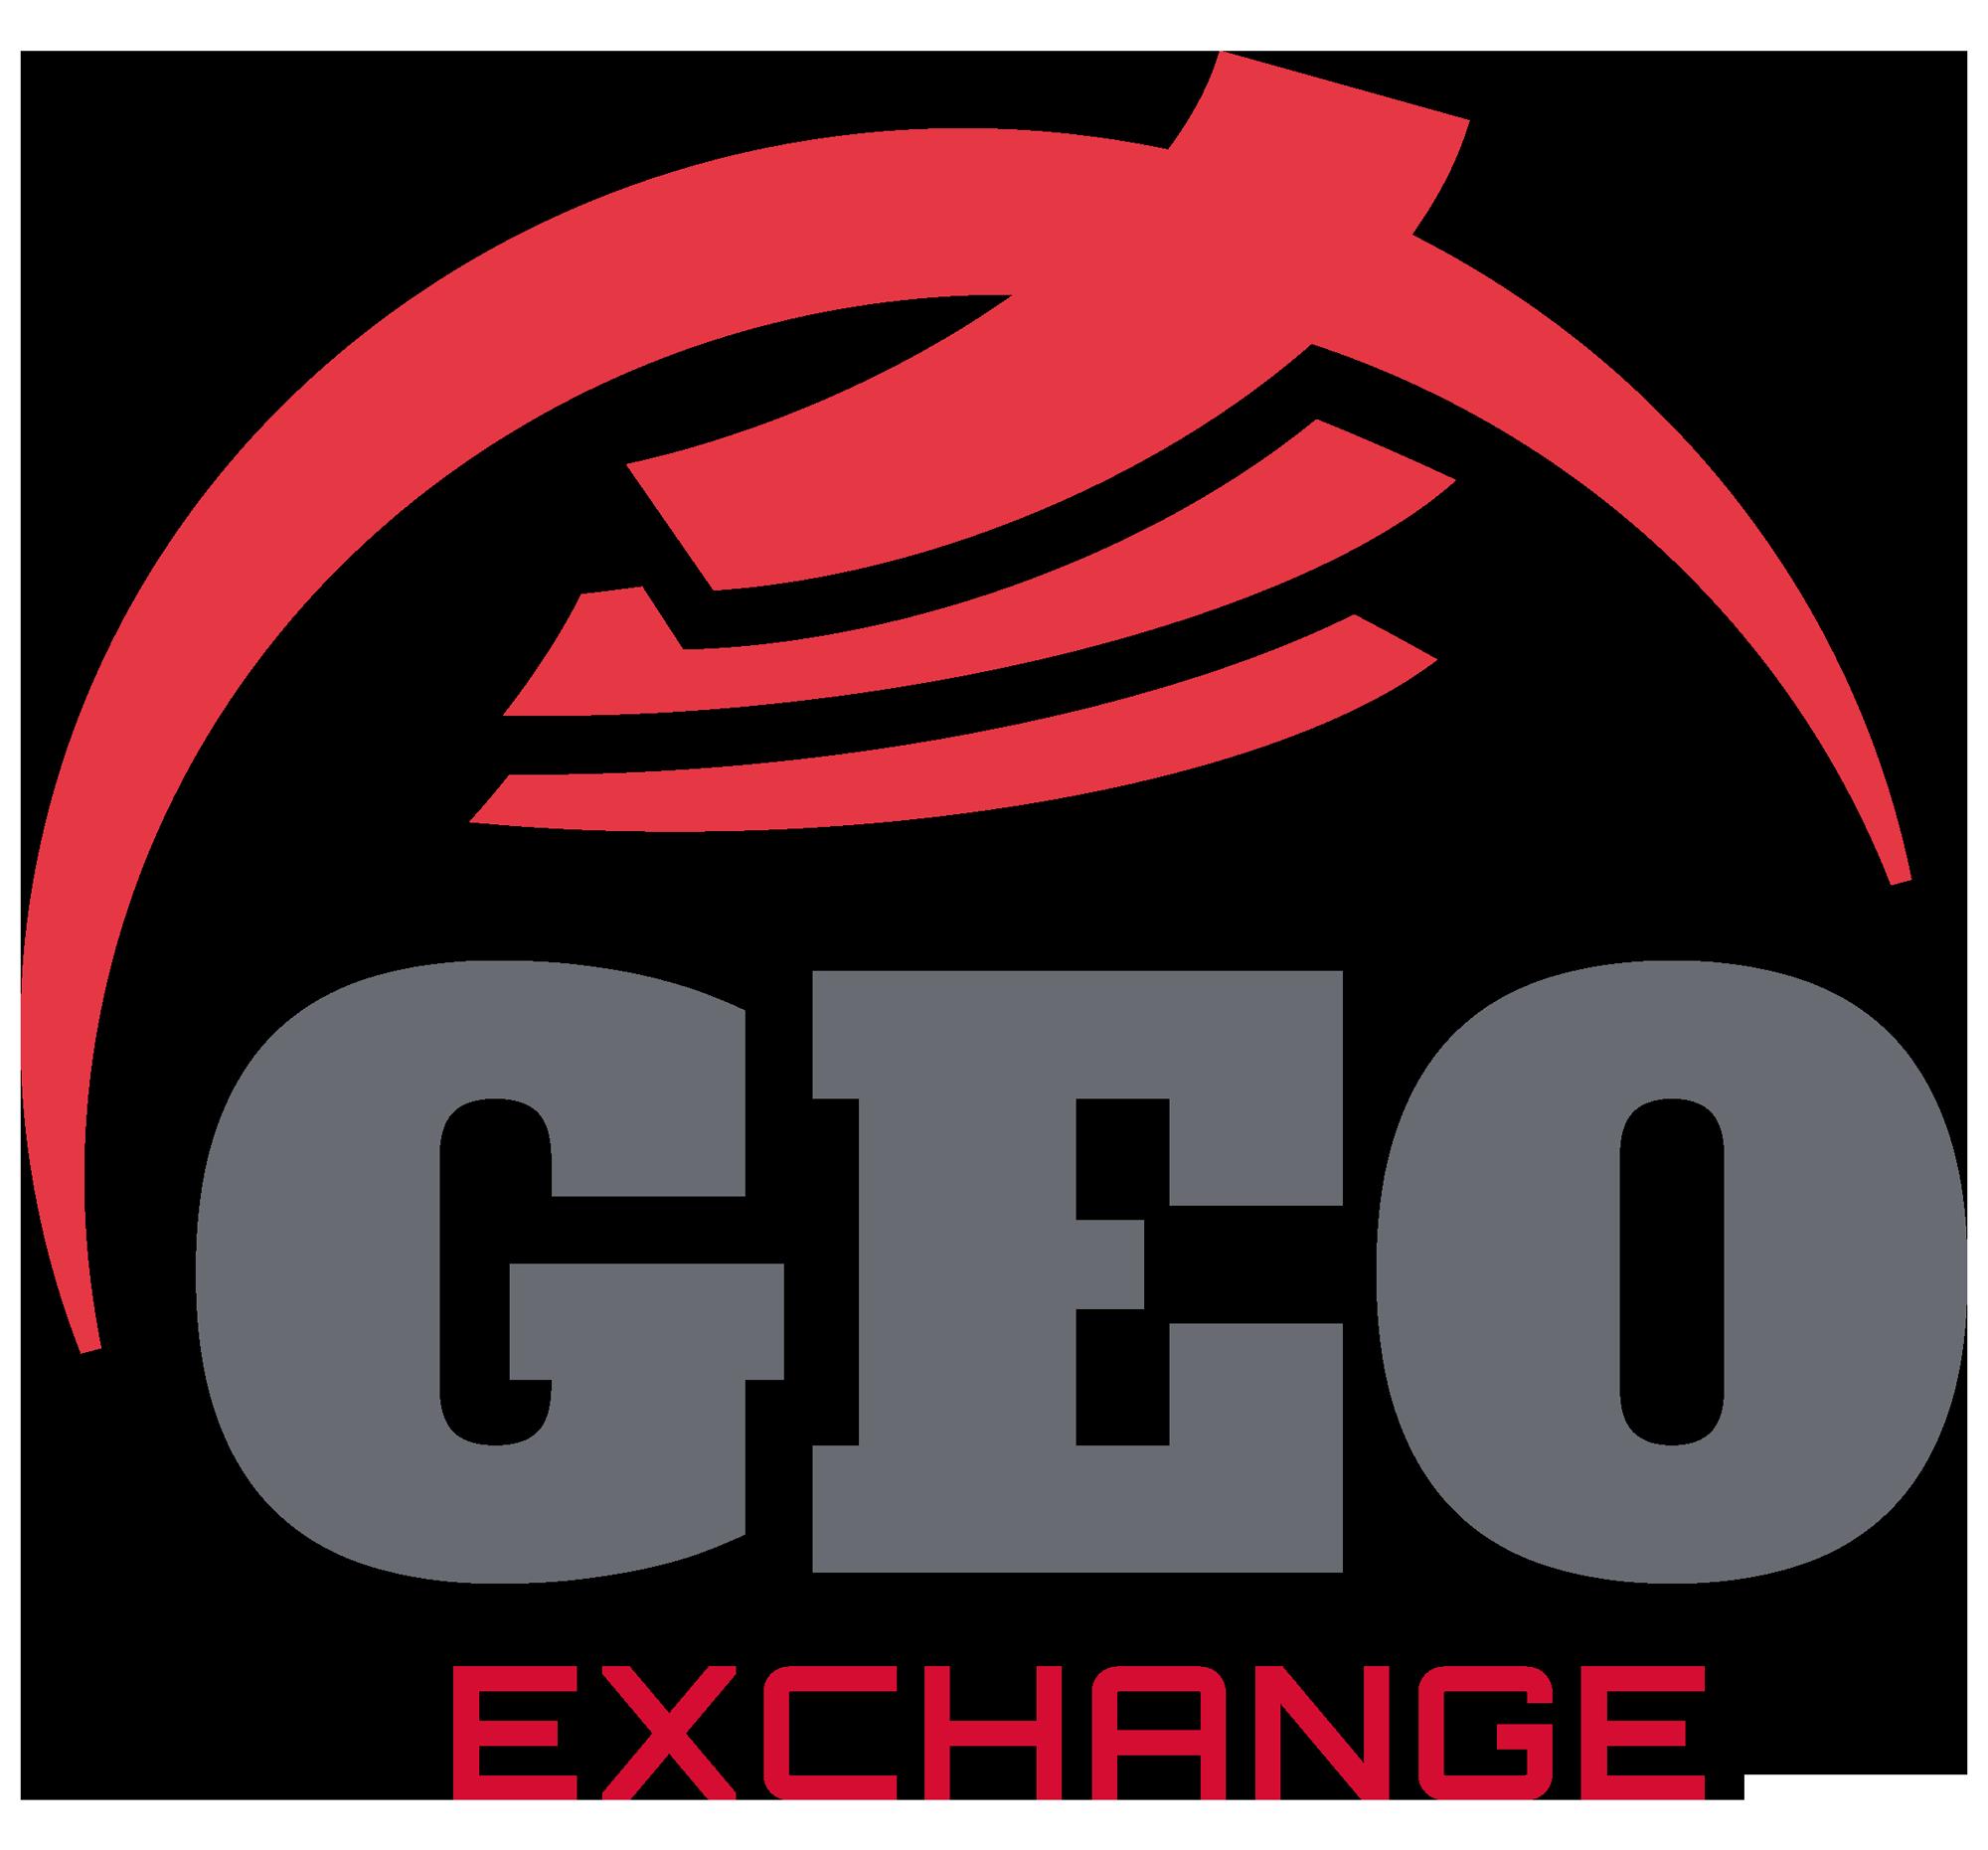 Bureau de change GEO SA